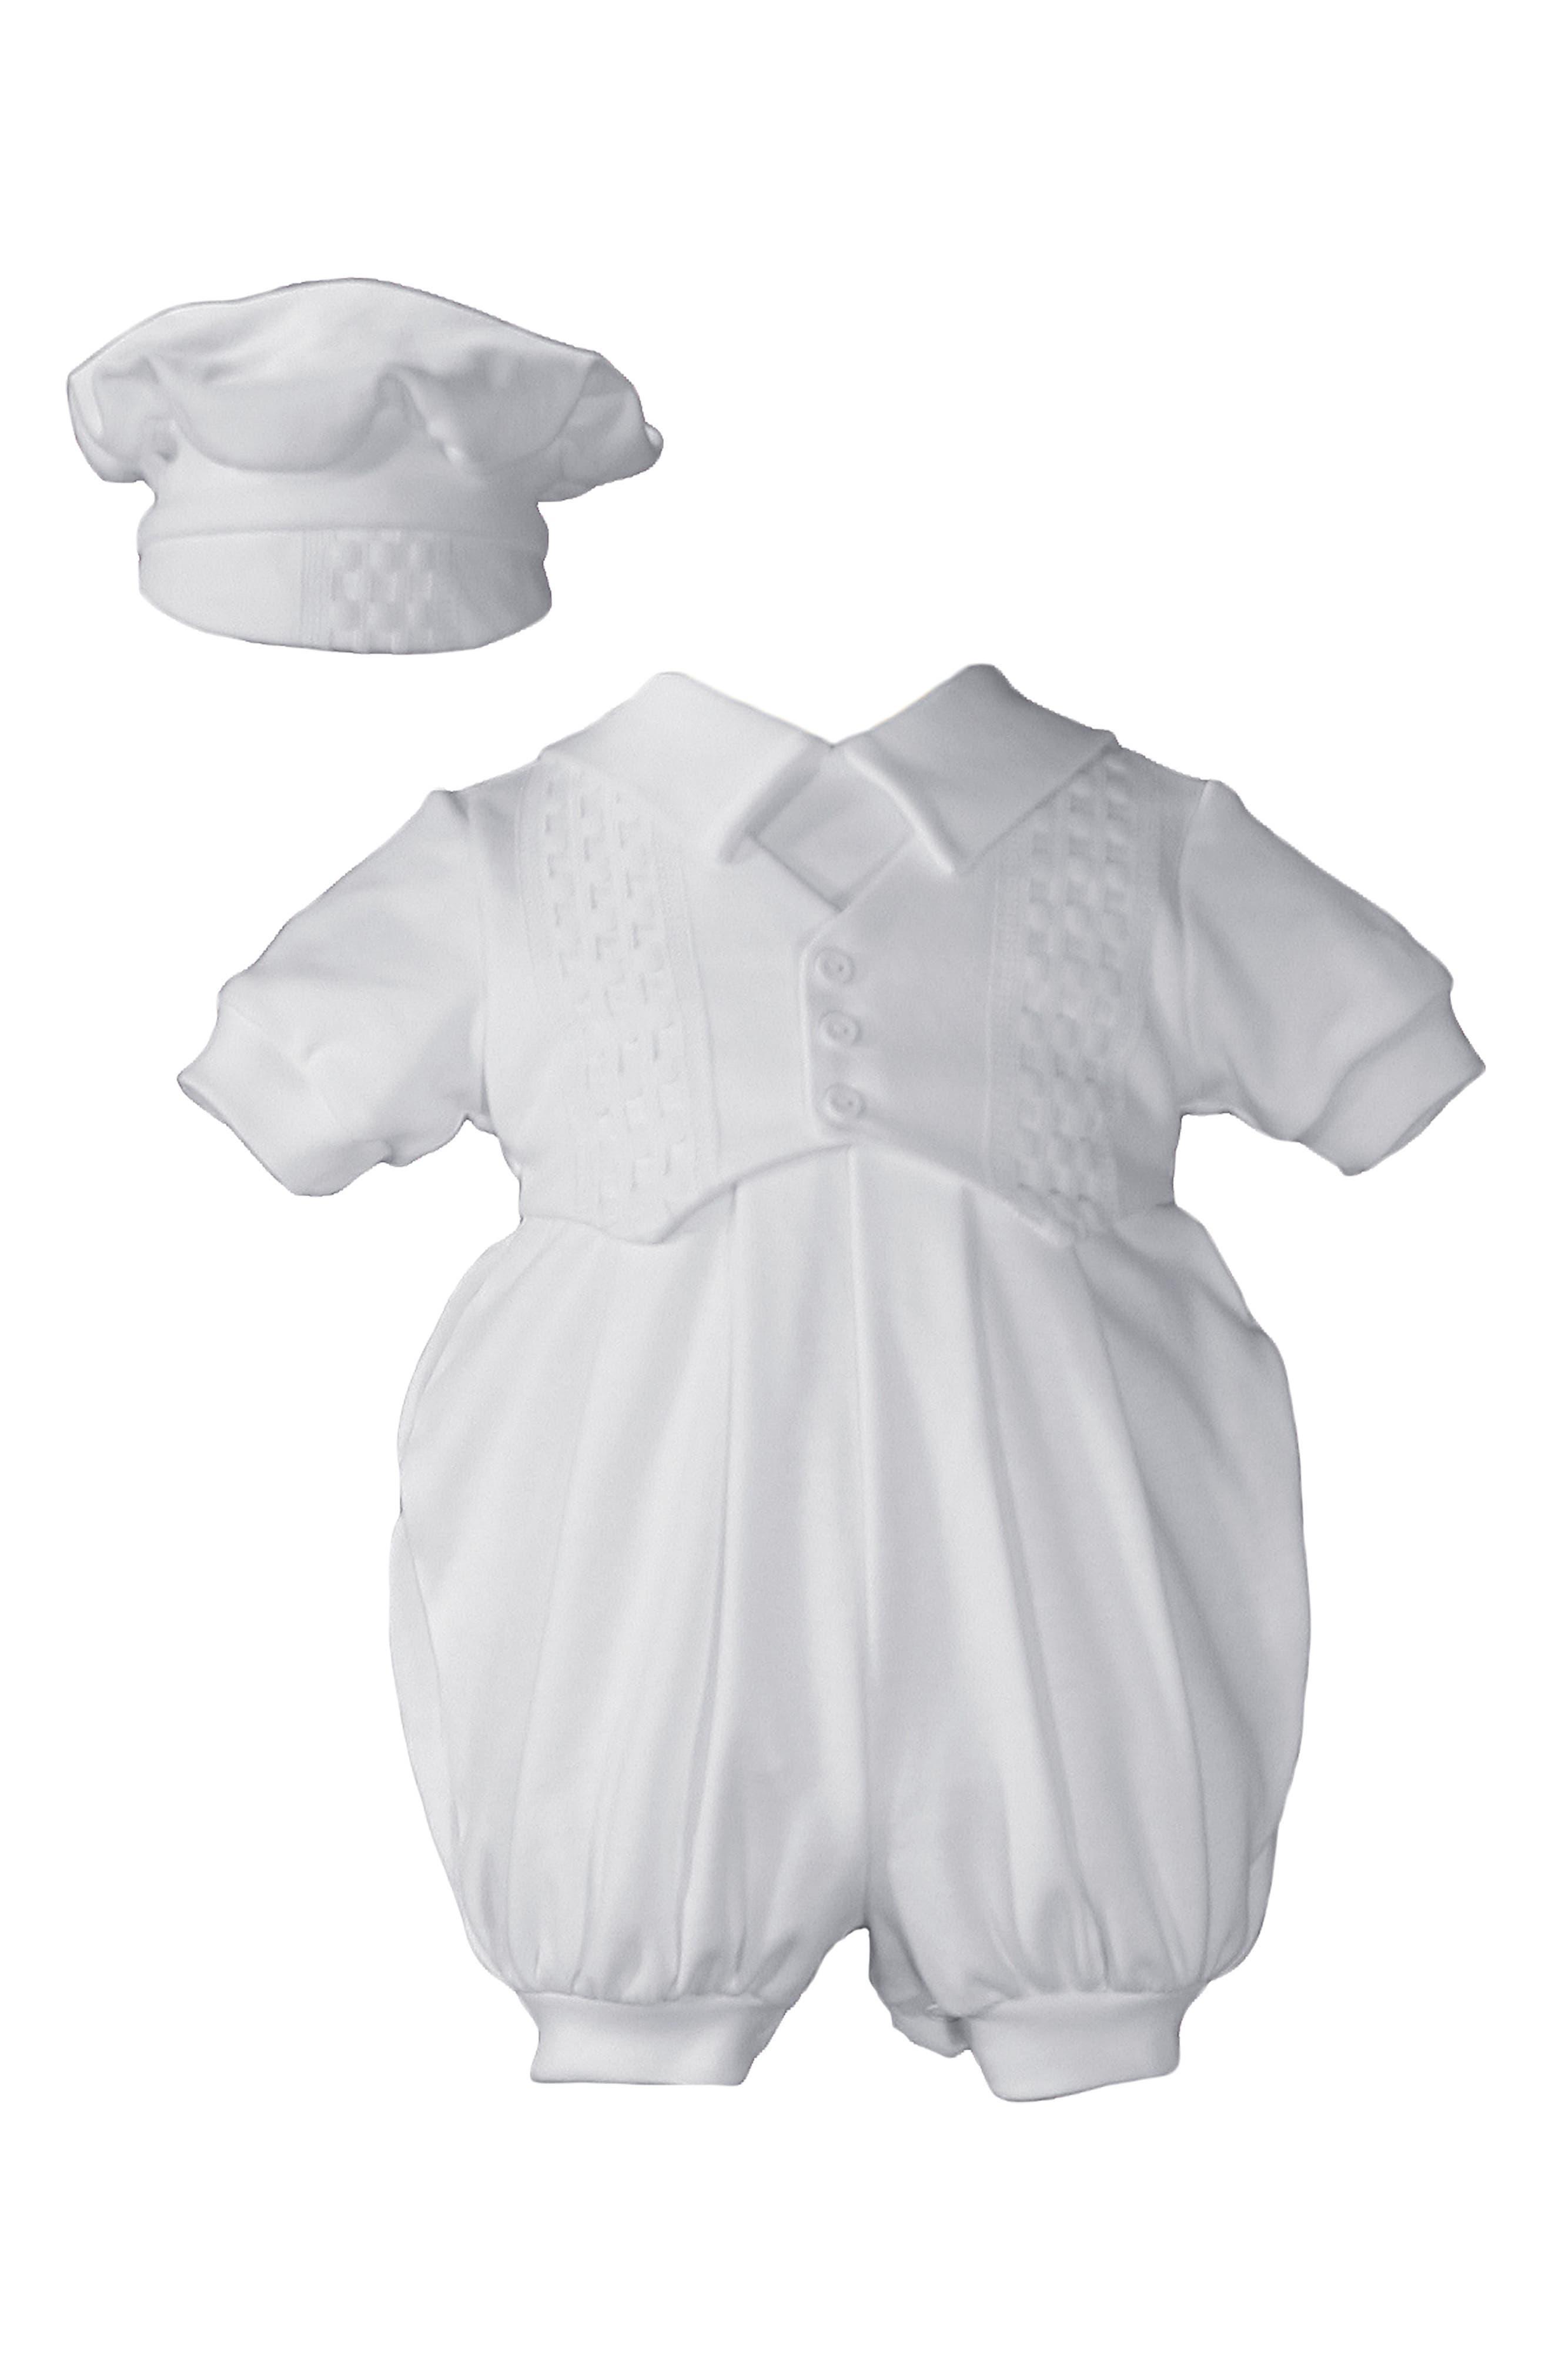 Little Things Mean A Lot Romper & Hat Set (Baby Boys)